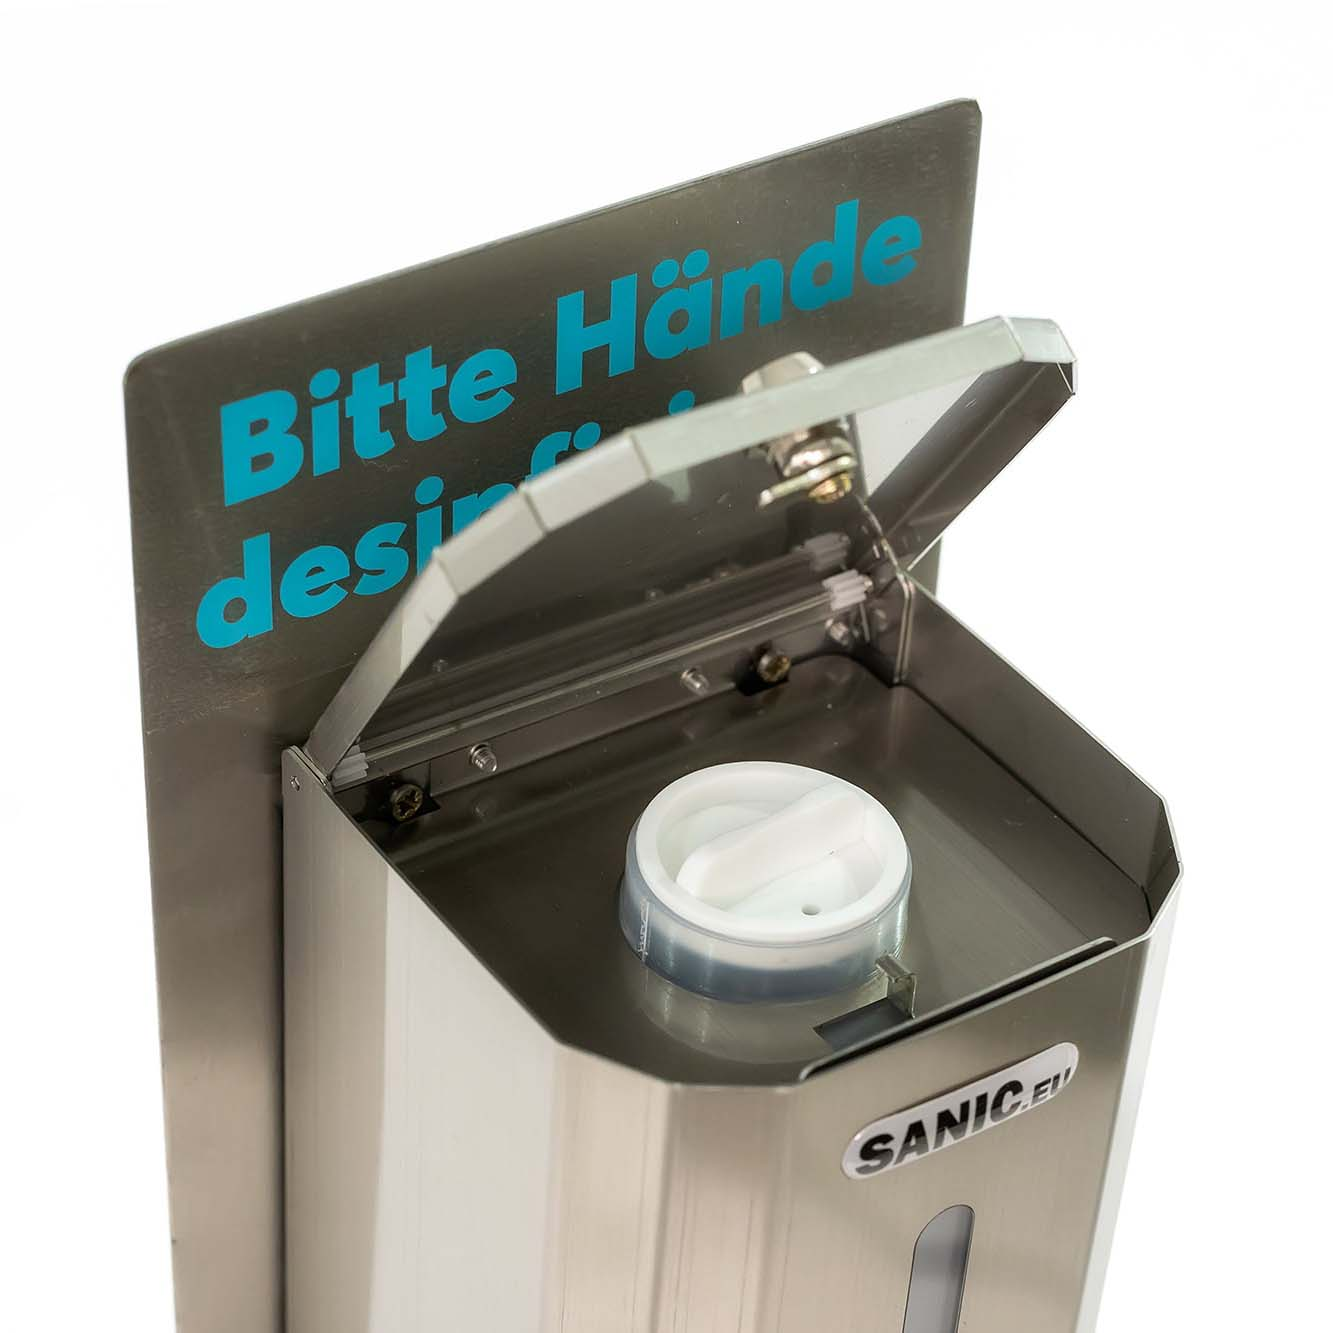 Desinfektionsspender aus Edelstahl mit Sensor